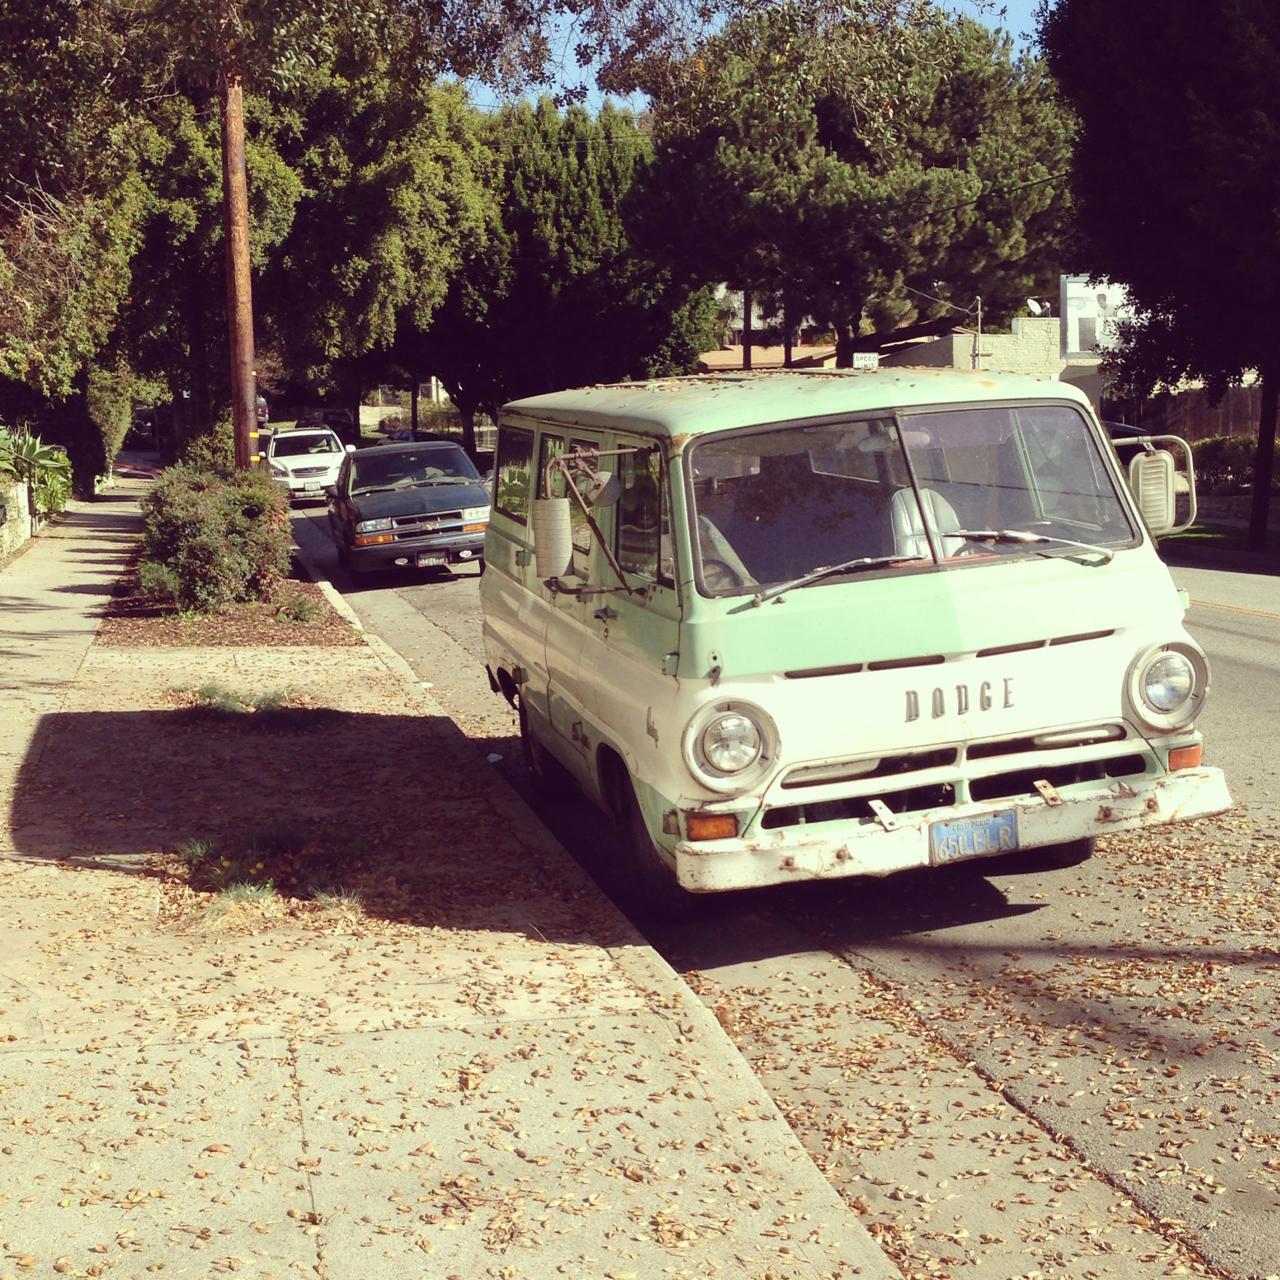 A pretty awesome van.